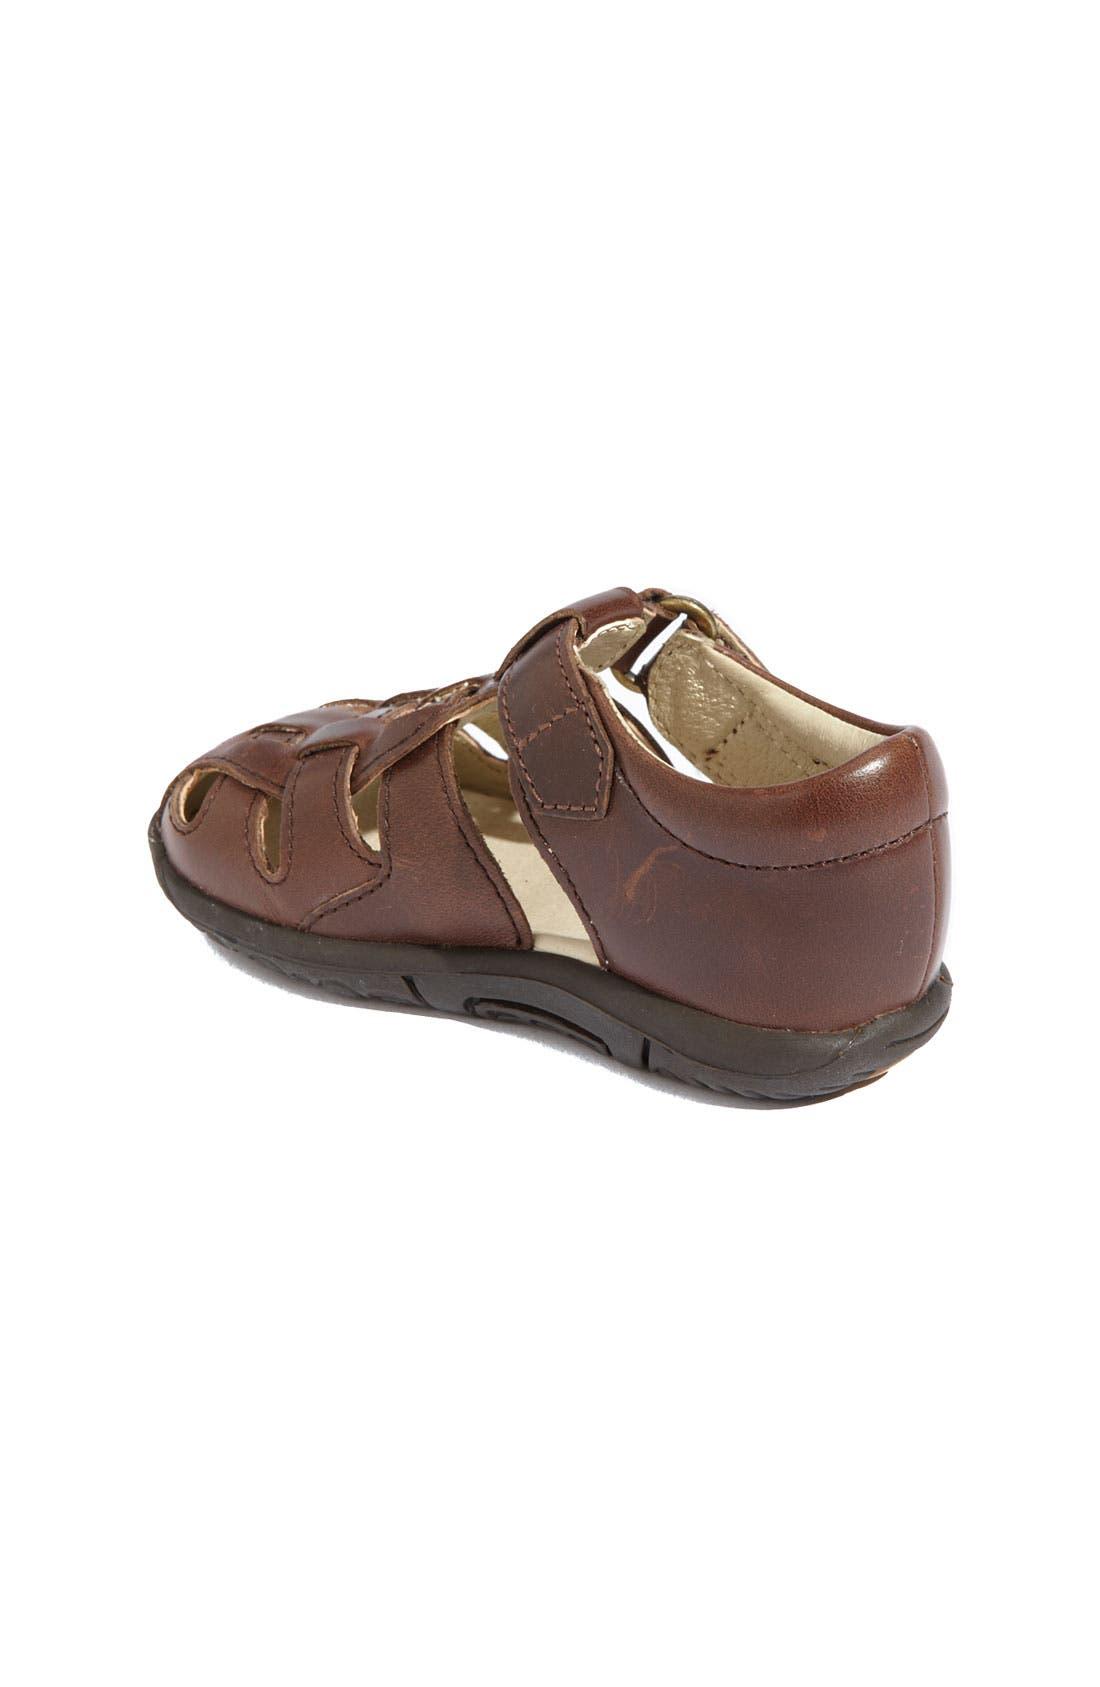 Alternate Image 2  - Stride Rite 'Harper' Sandal (Baby, Walker & Toddler)